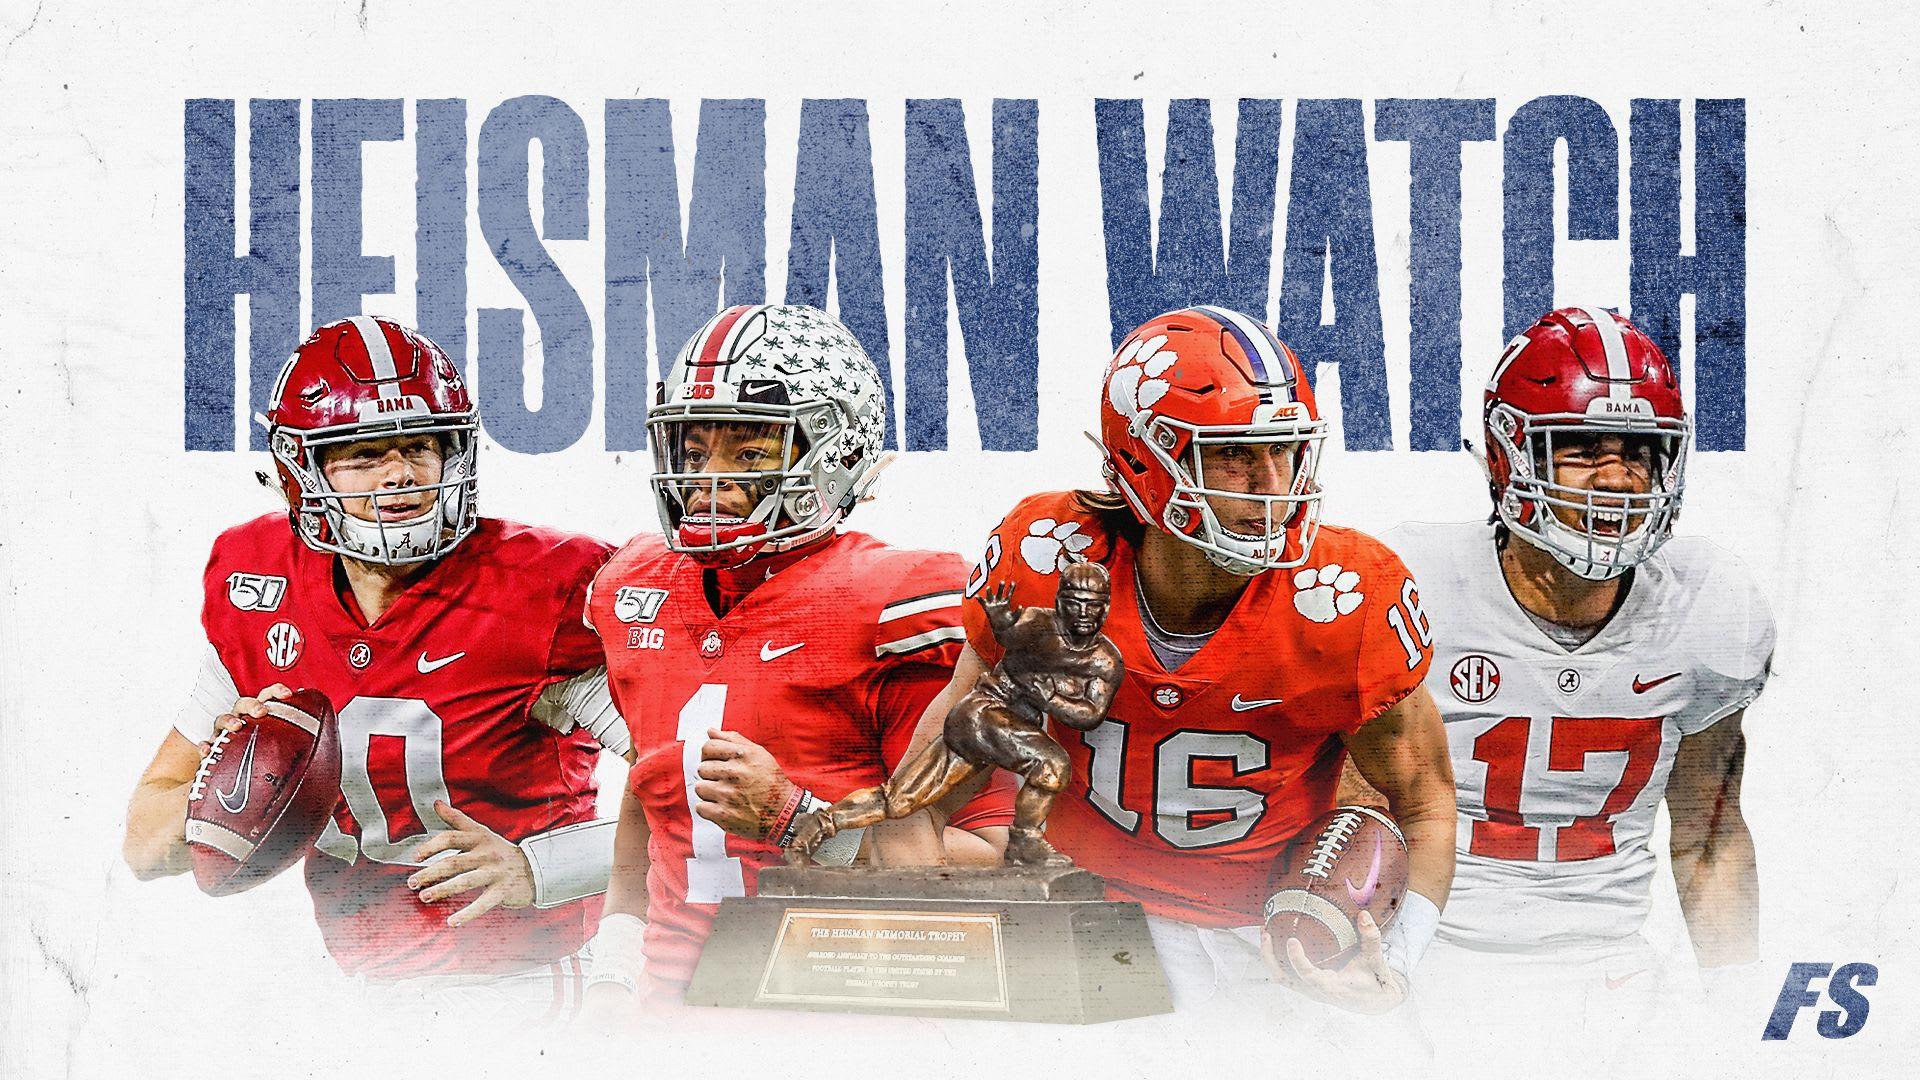 Heisman watch